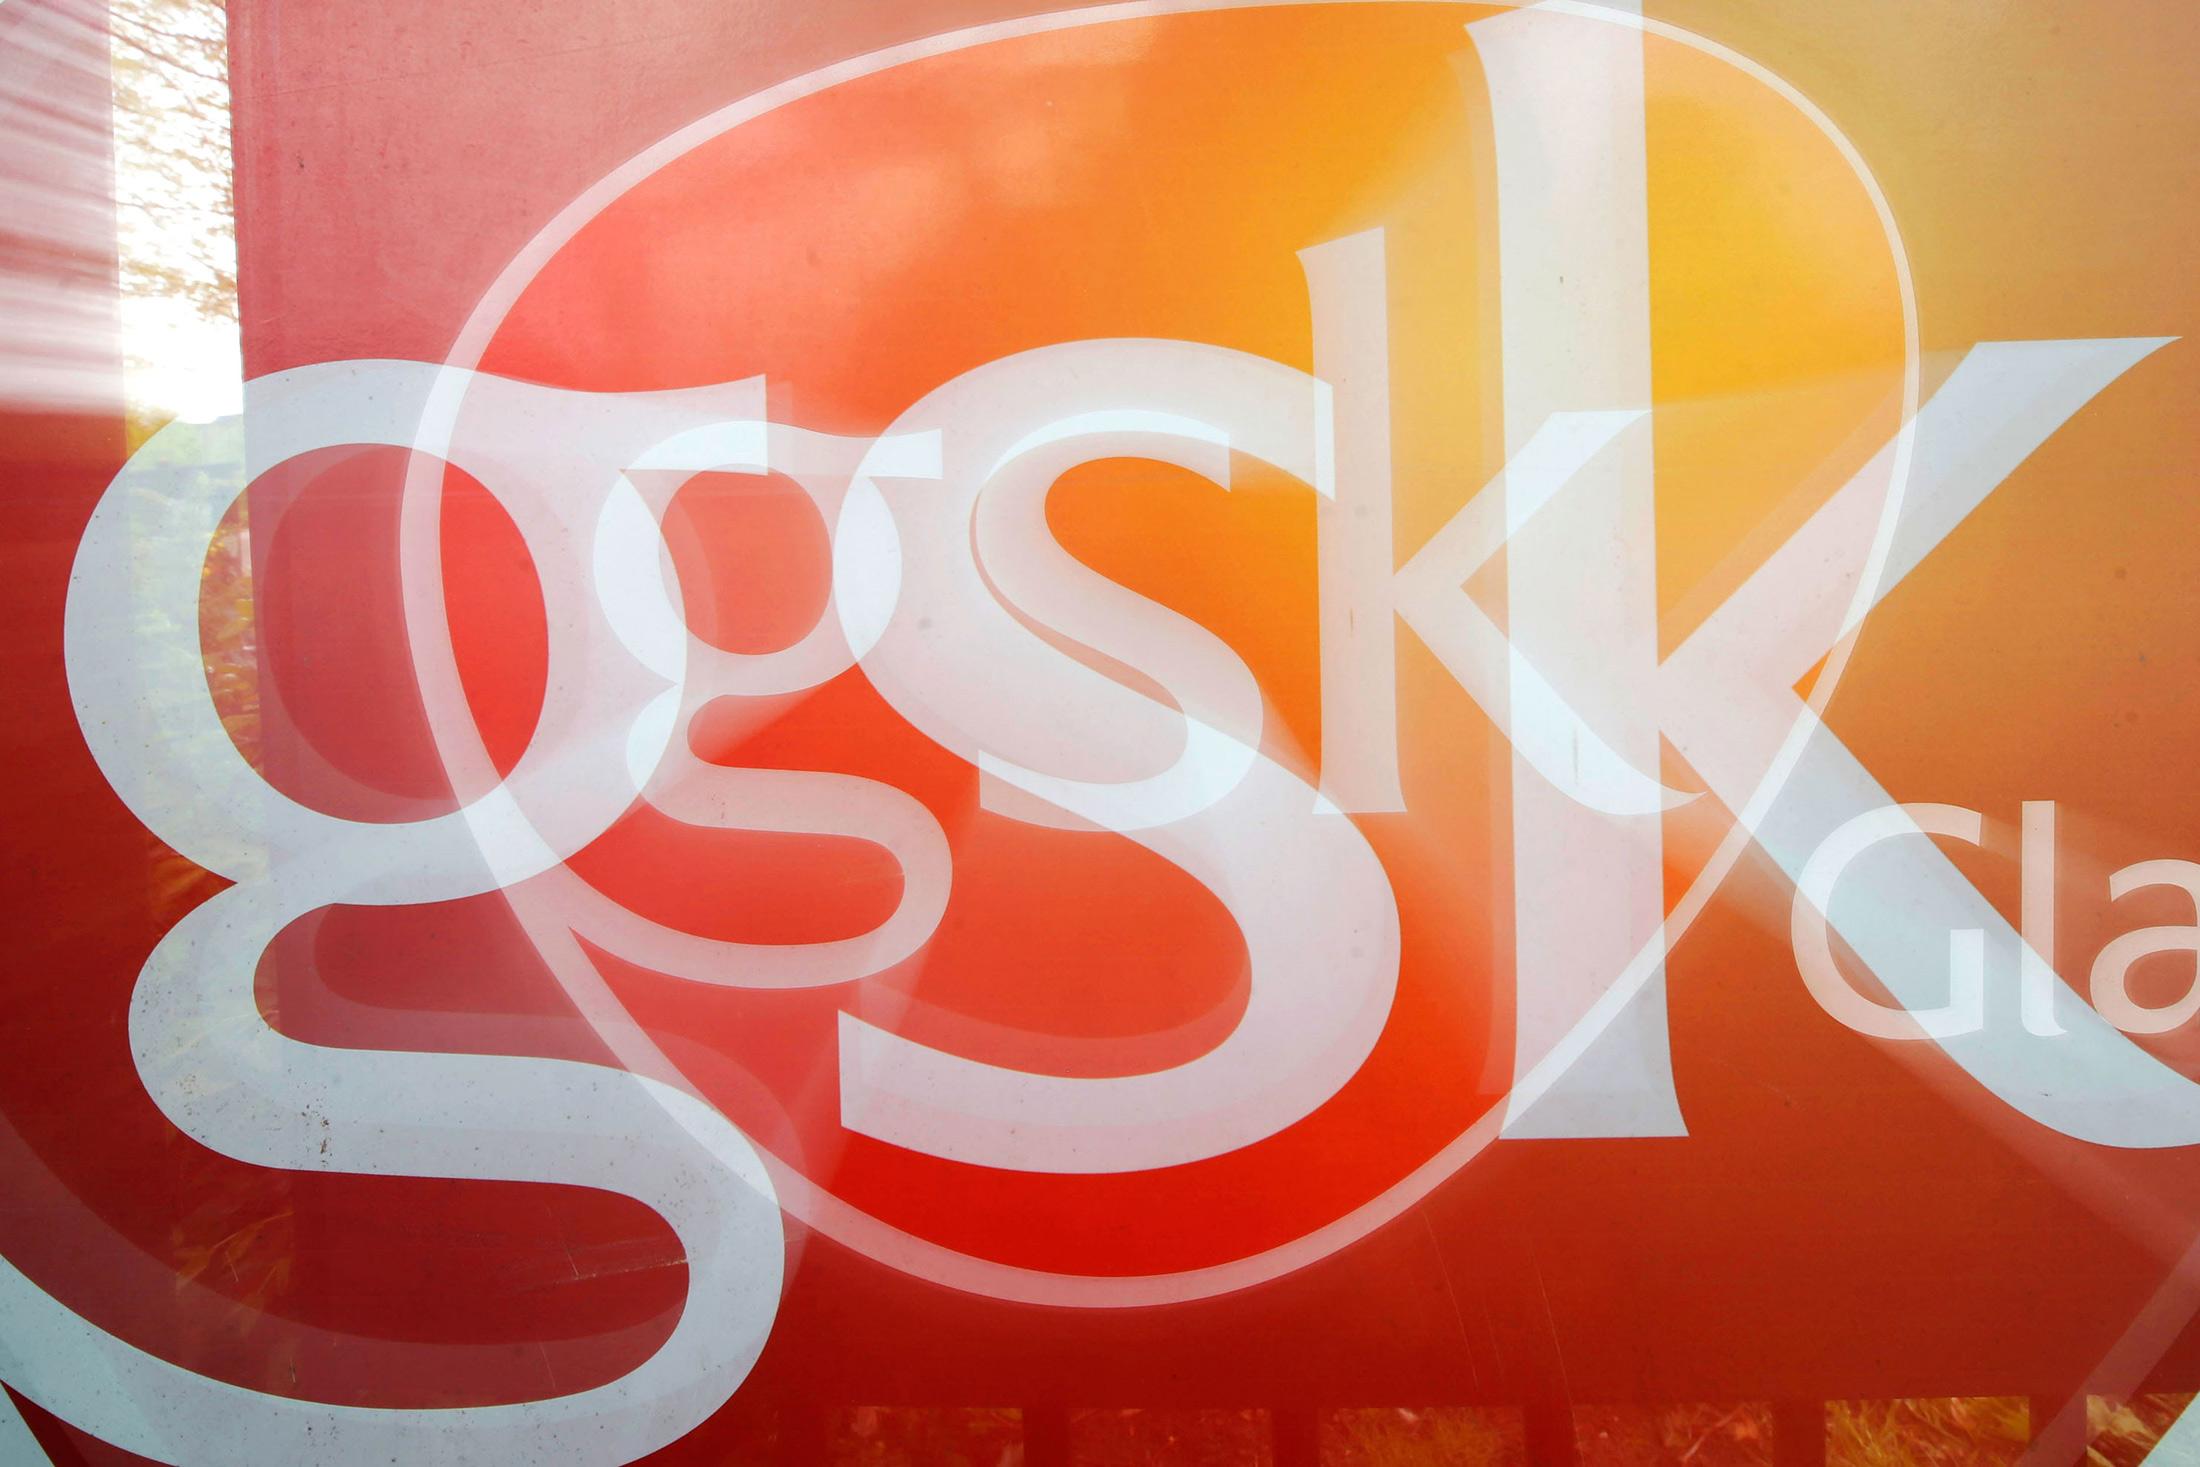 Gsklondon Stock Quote Glaxosmithkline Plc Bloomberg Markets